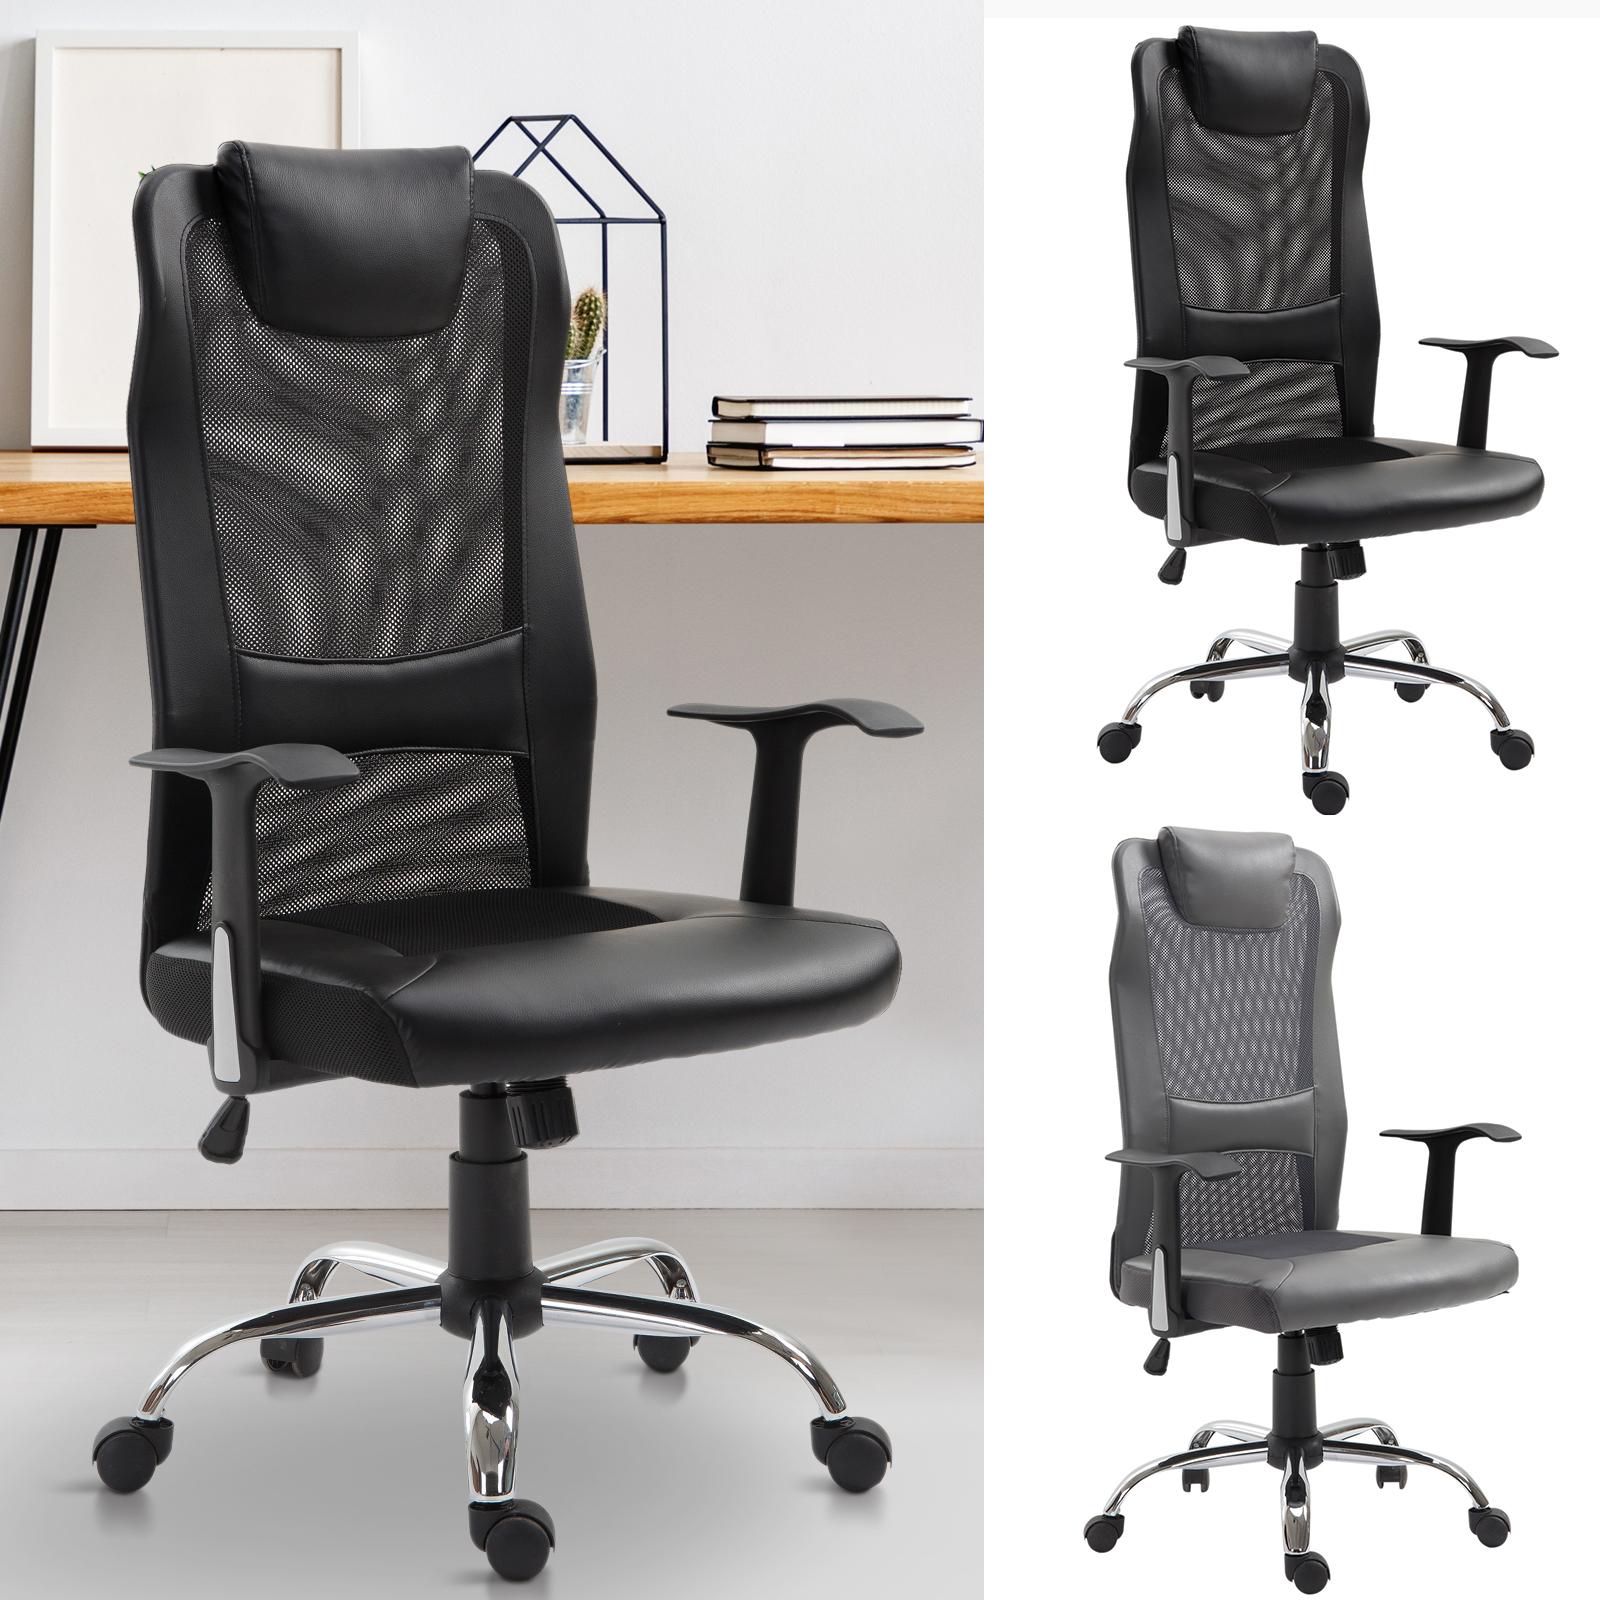 Vinsetto Bürostuhl Drehstuhl Chefsessel Schreibtischstuhl höhenverstellbar